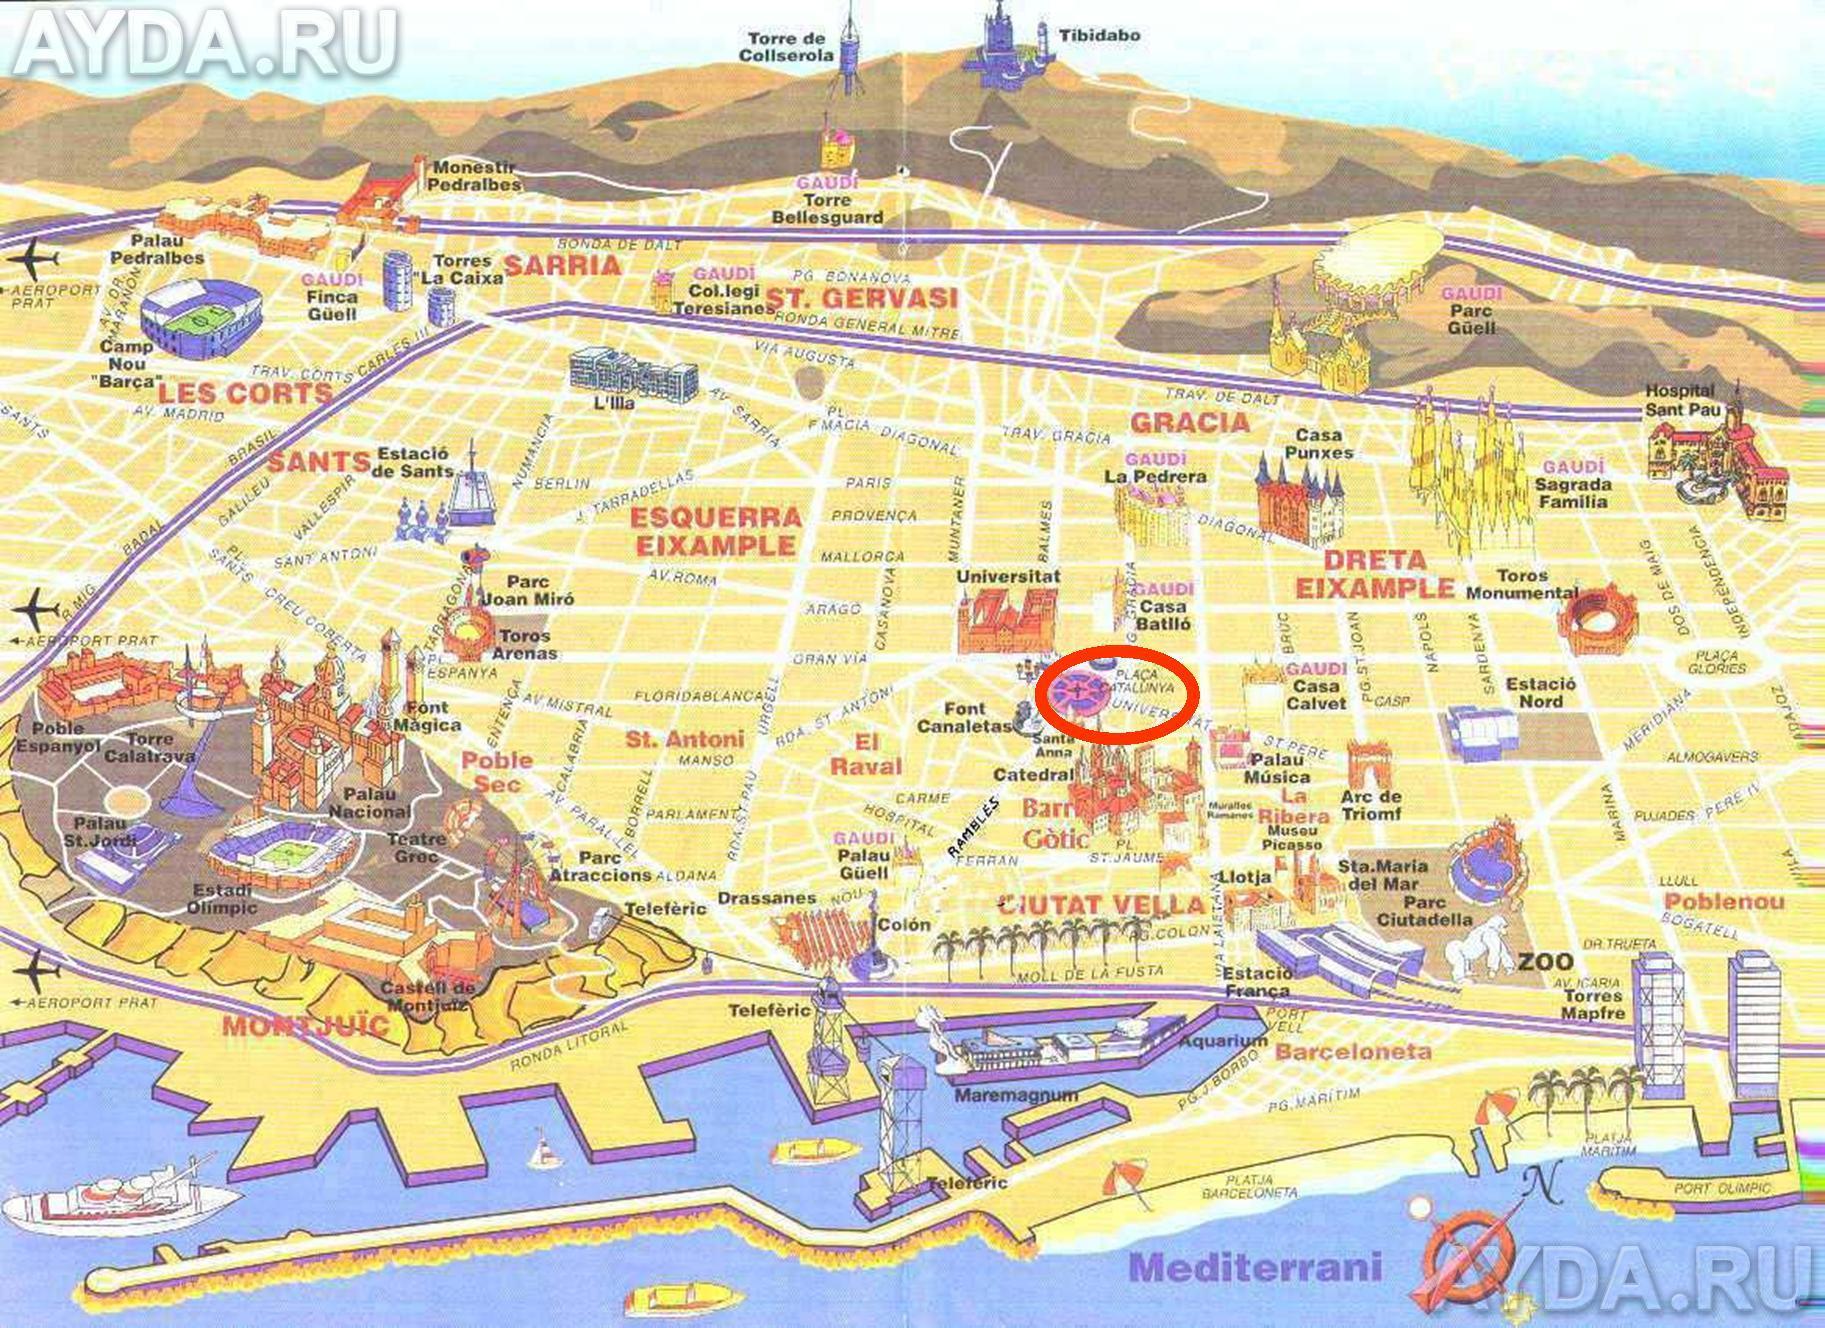 Подробные карты Барселоны: Барселона на карте Испании ...: http://www.espanatur.ru/goroda-i-kurorty/karta-barcelonu.html